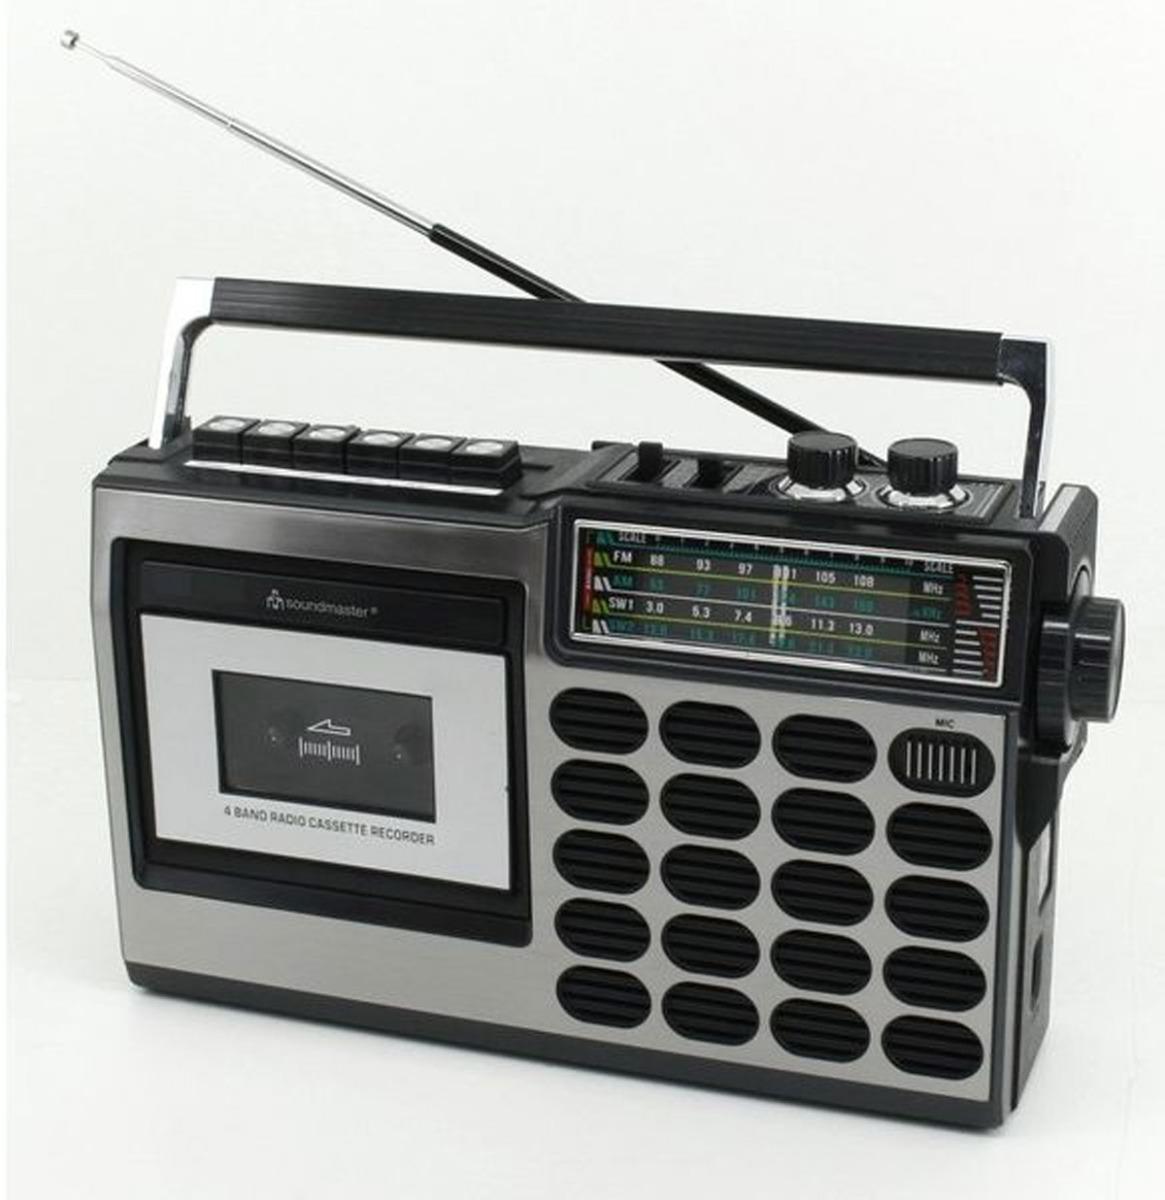 Soundmaster RR18SW Radio Cassette Recorder - Met Bluetooth